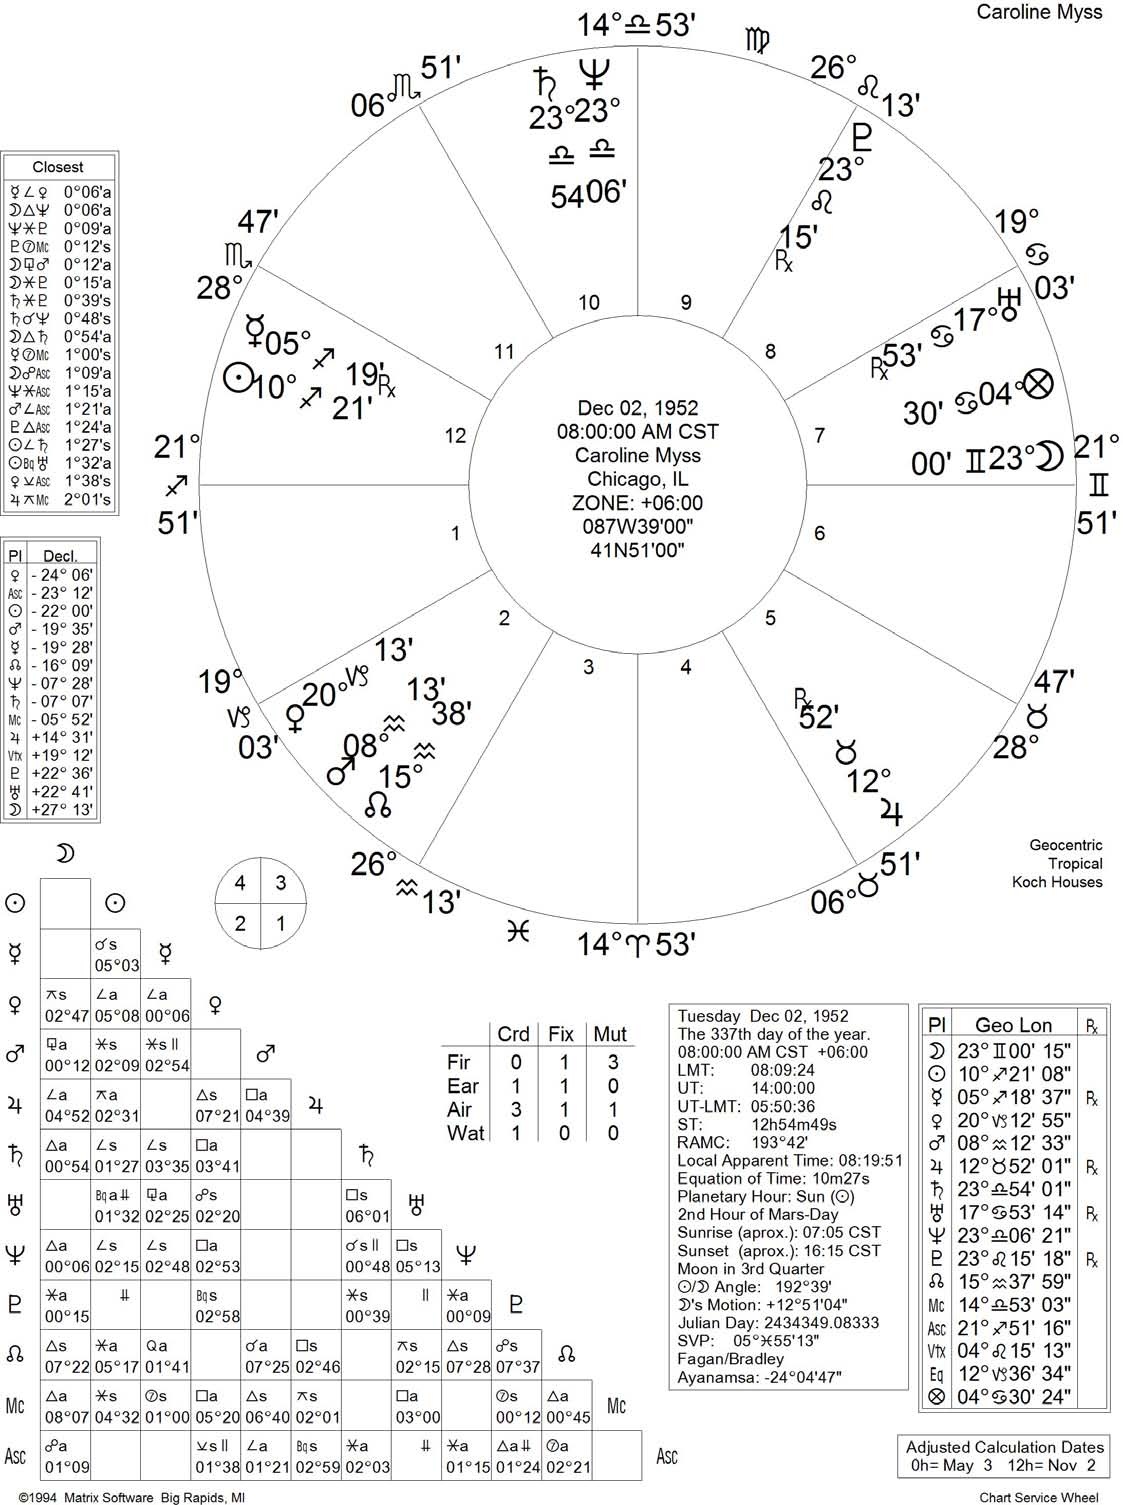 Astrolos - Carlos's astrology writings